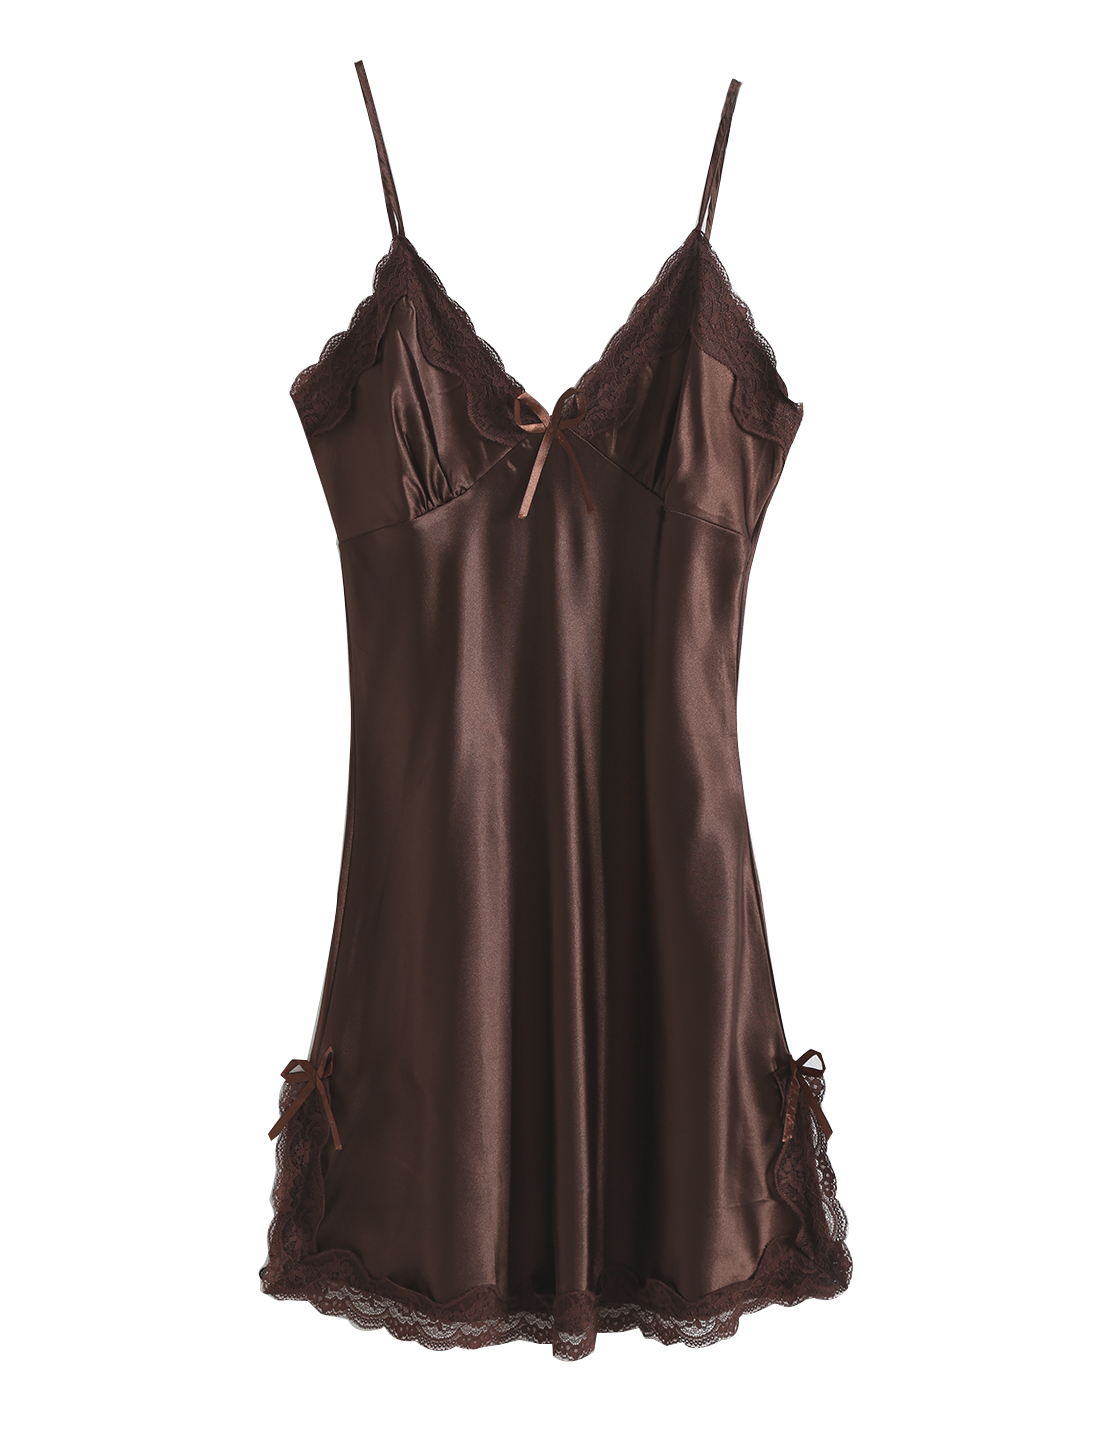 Women Satin Lace Trim Sleepwear Nightgown Pajama Slip Dress Coffee-Lace L